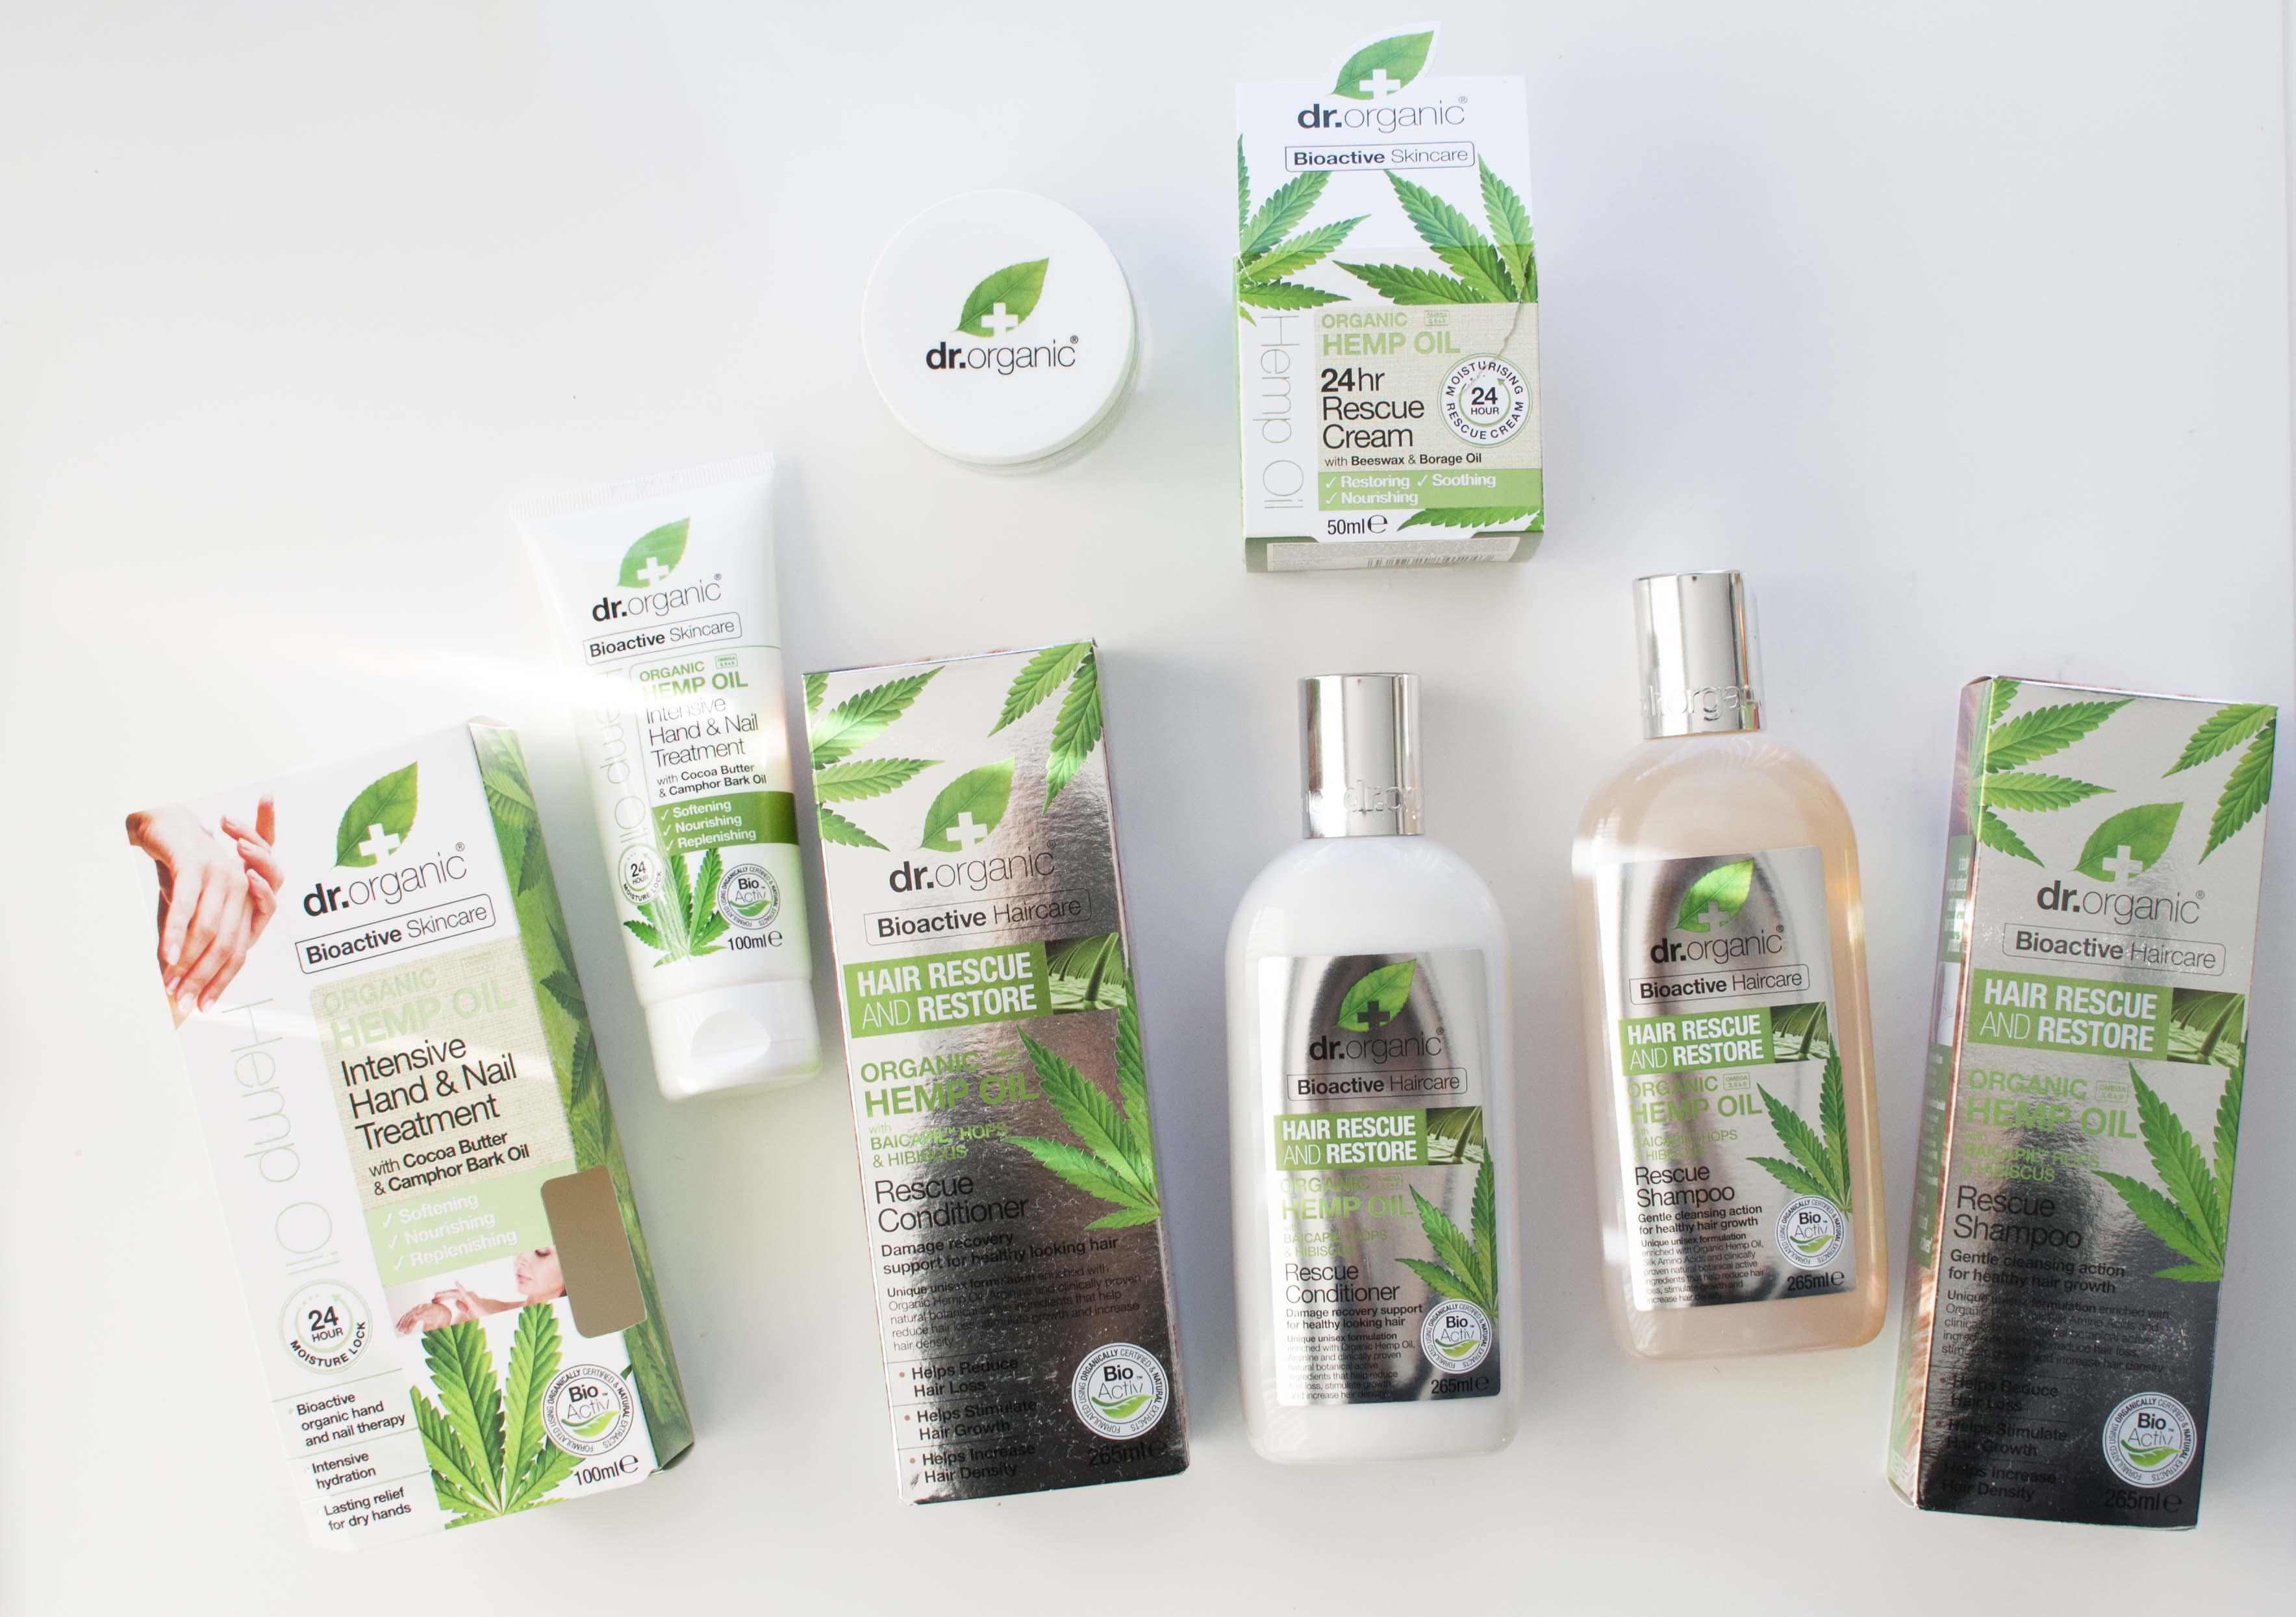 review dr organic hemp oil shampoo conditioner hand cream face cream